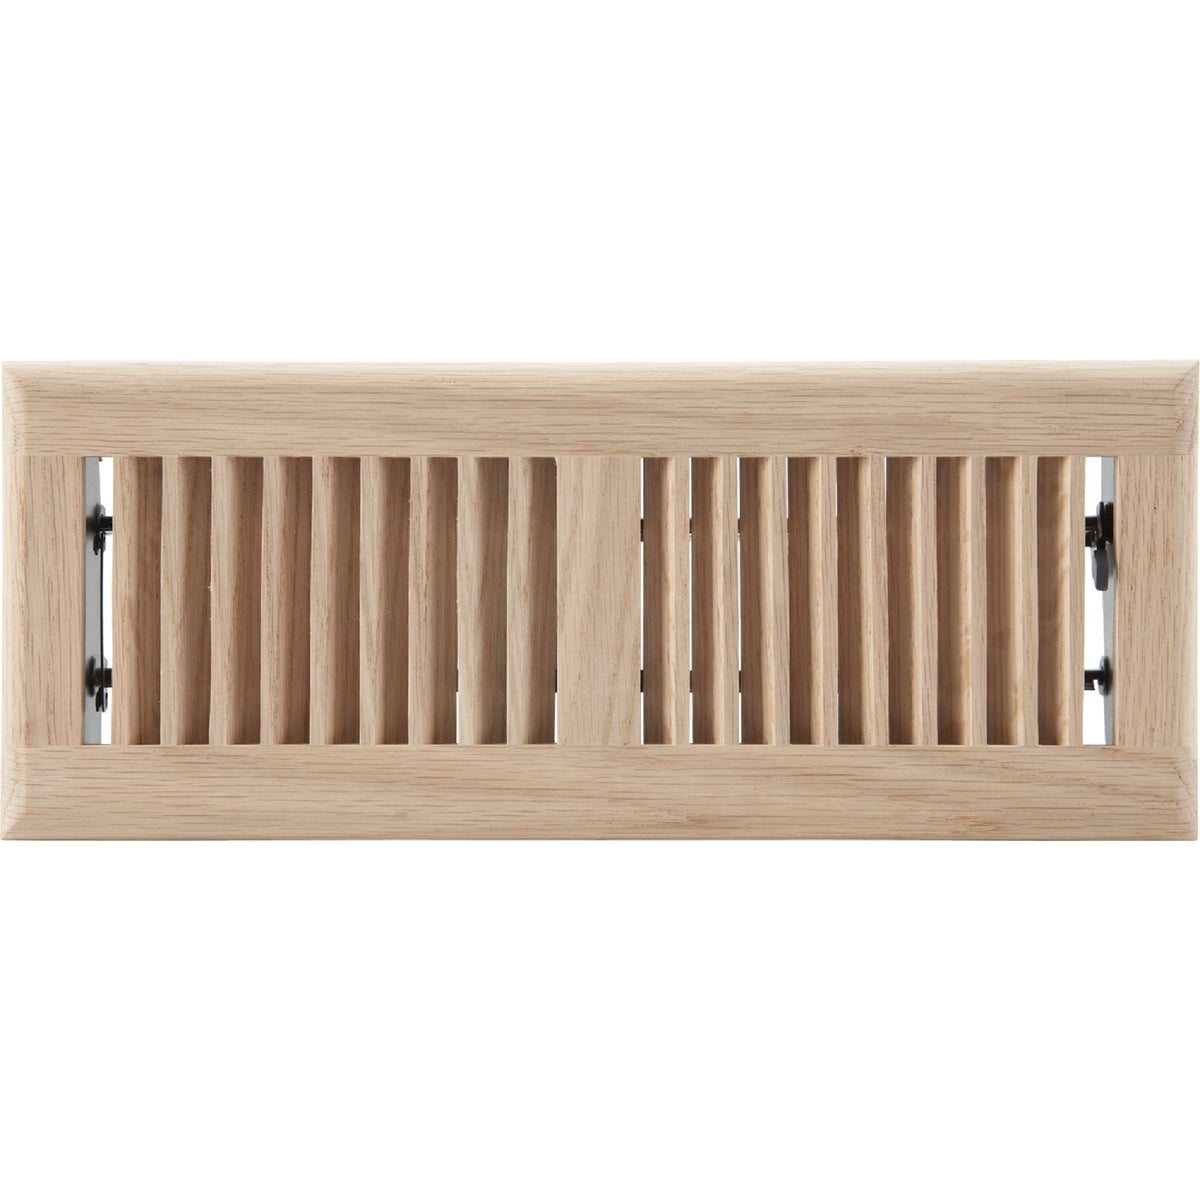 Home Impressions Natural Oak Floor Register, WF0412N0